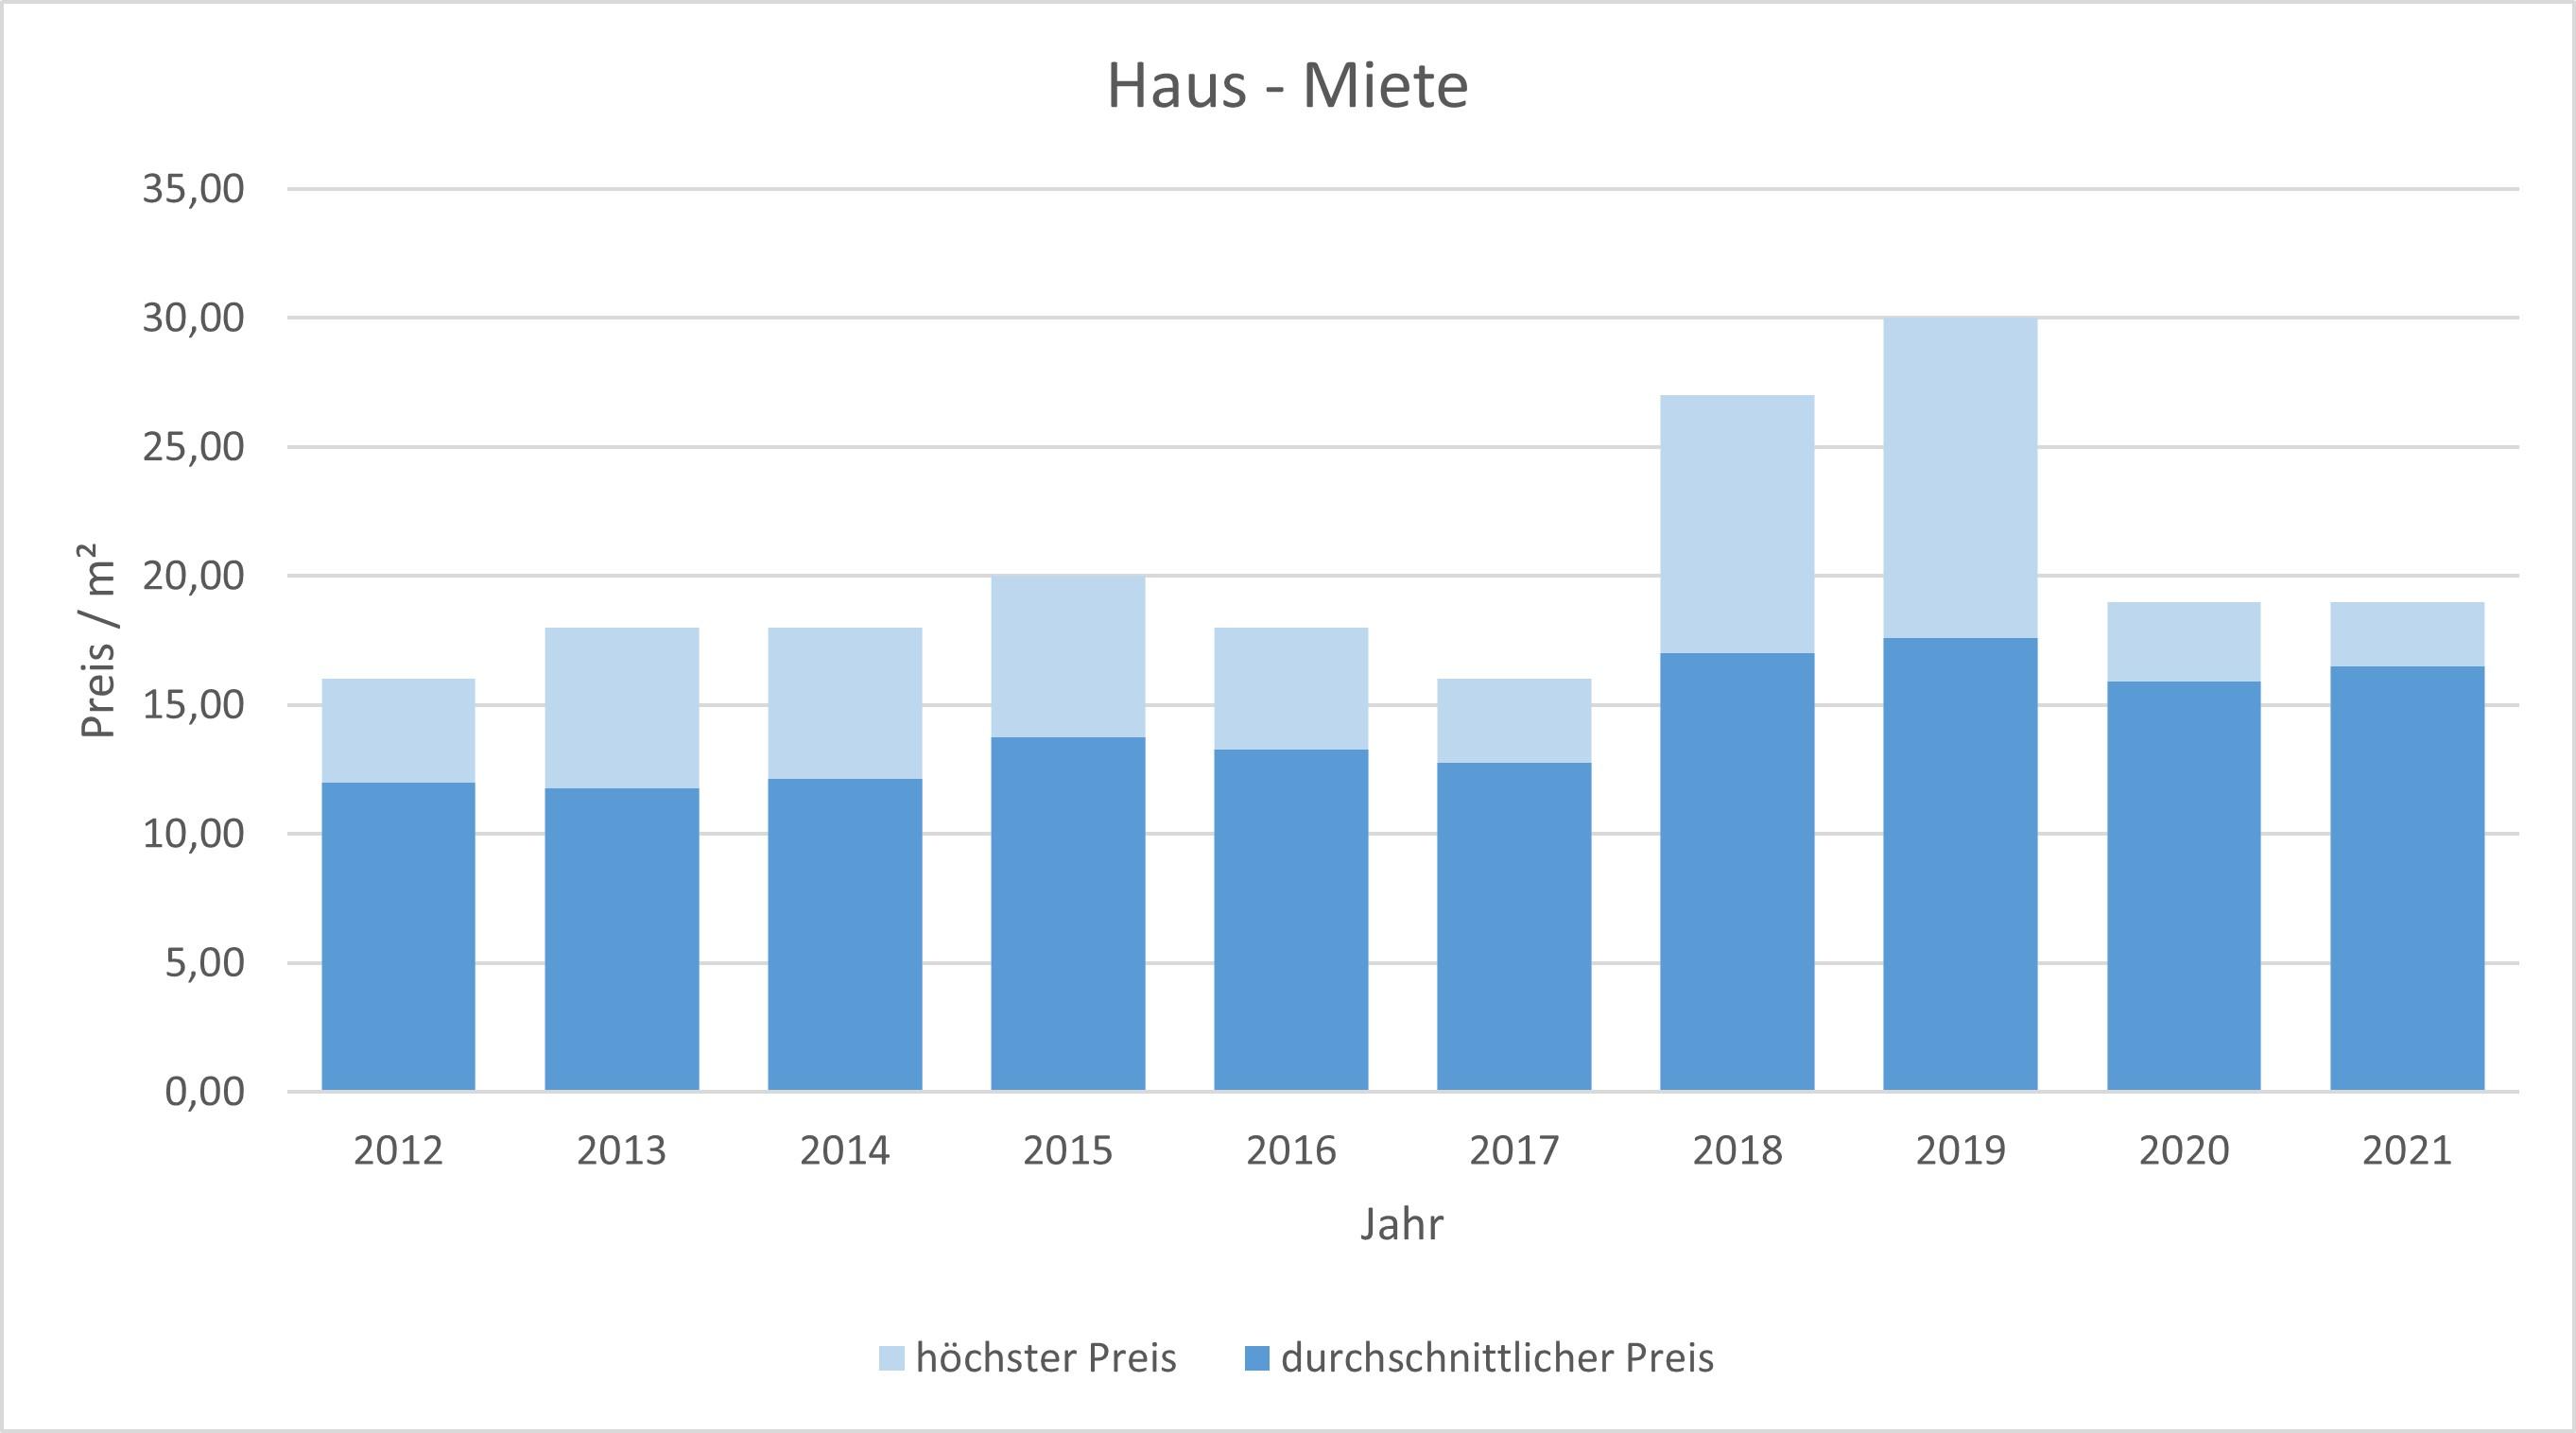 Garching Haus mieten vermieten Preis Bewertung Makler www.happy-immo.de  2019 2020 2021